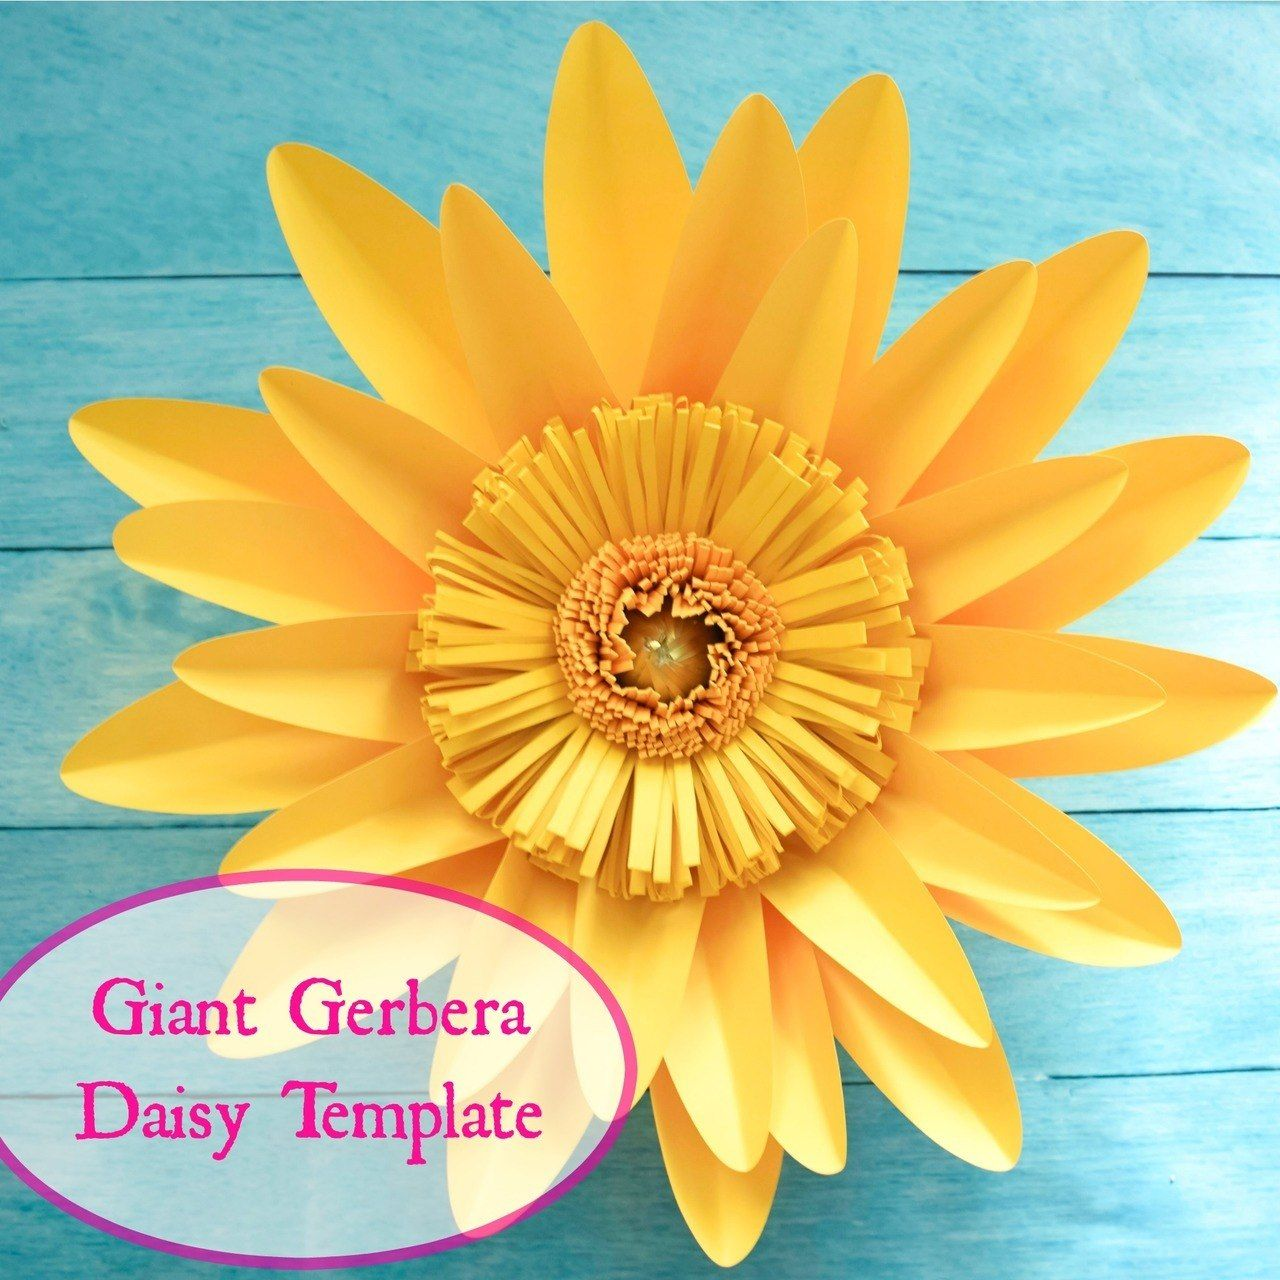 Giant Gerbera Daisy Paper Flower Template Paper Flower Template Paper Flowers Flower Template